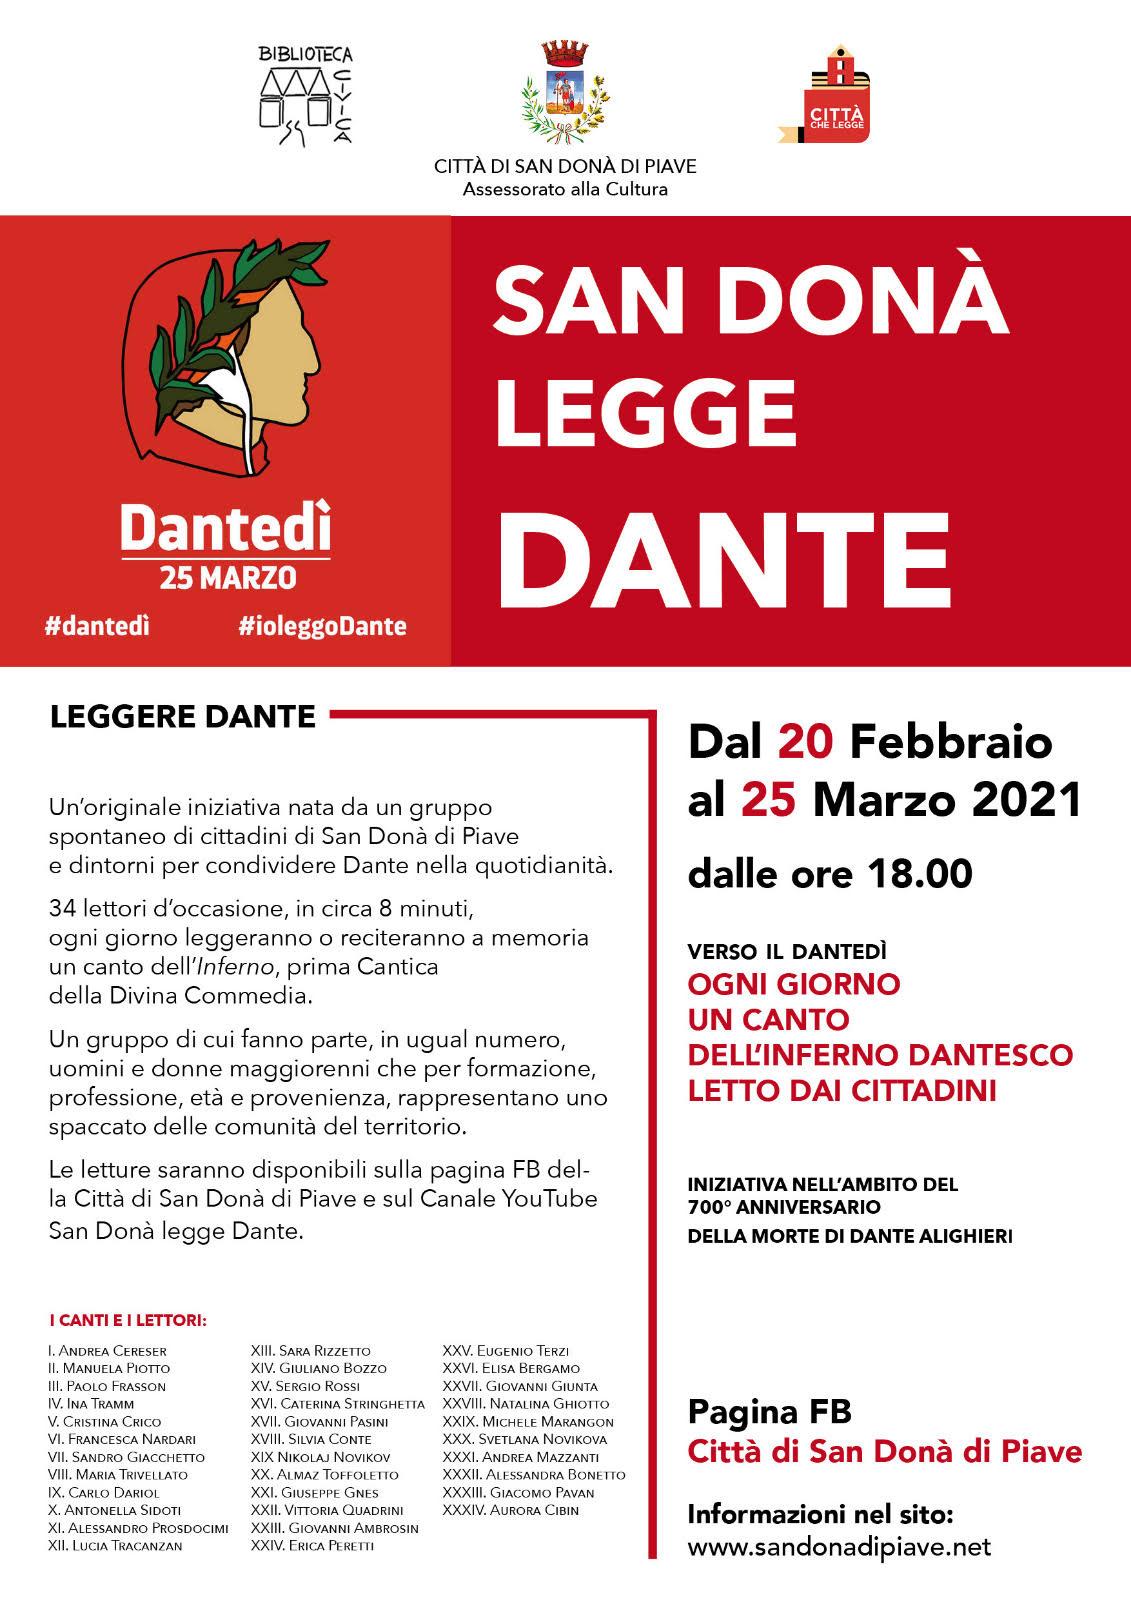 Immagine #Danteday: San Donà reads Dante